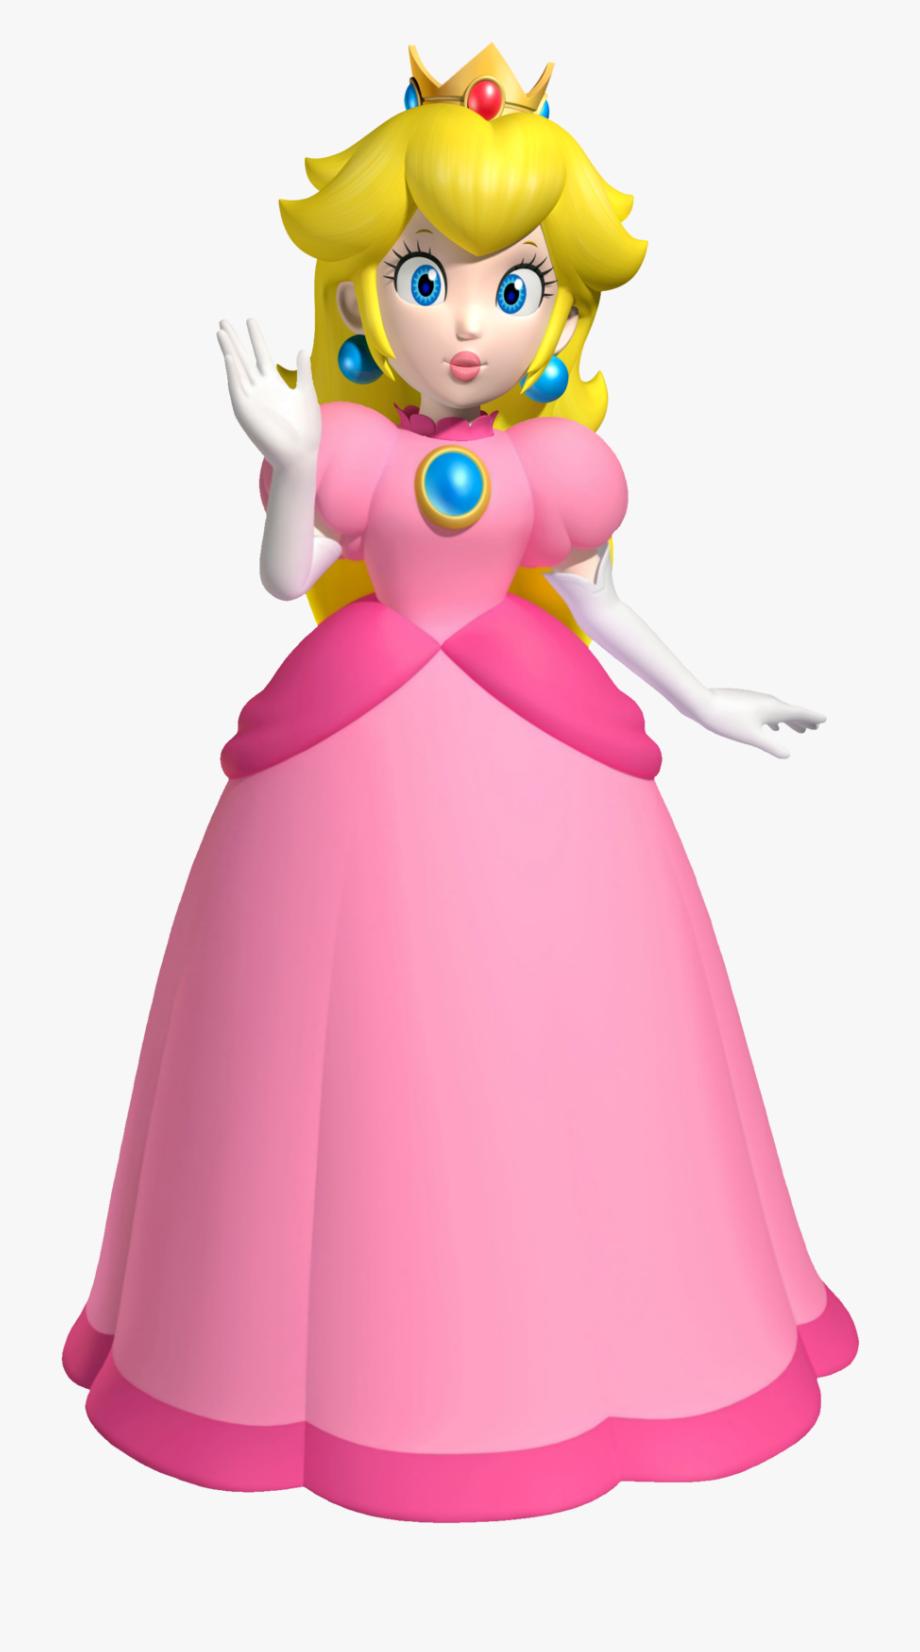 Mario Clipart Peach Mario Peach Transparent Free For